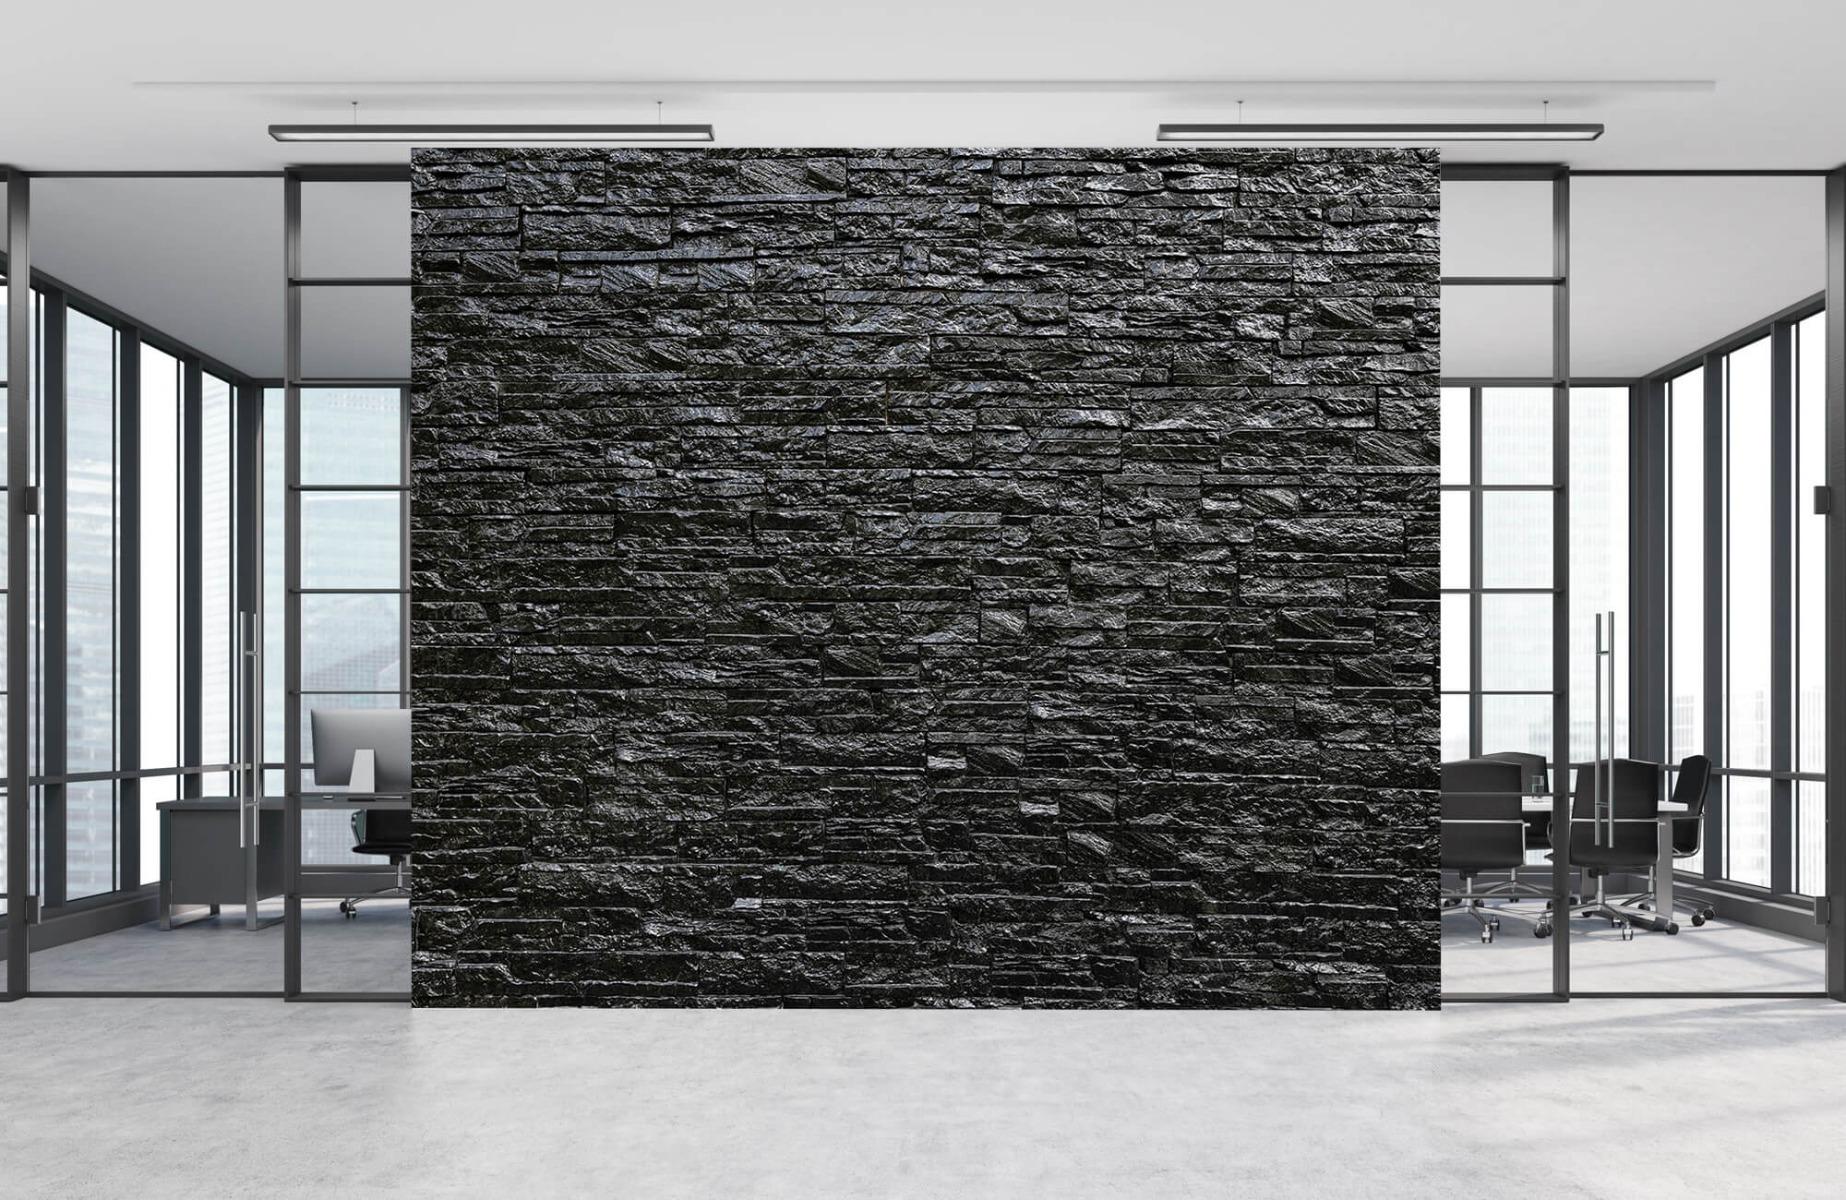 Steen behang - Zwarte stenen - Slaapkamer 8